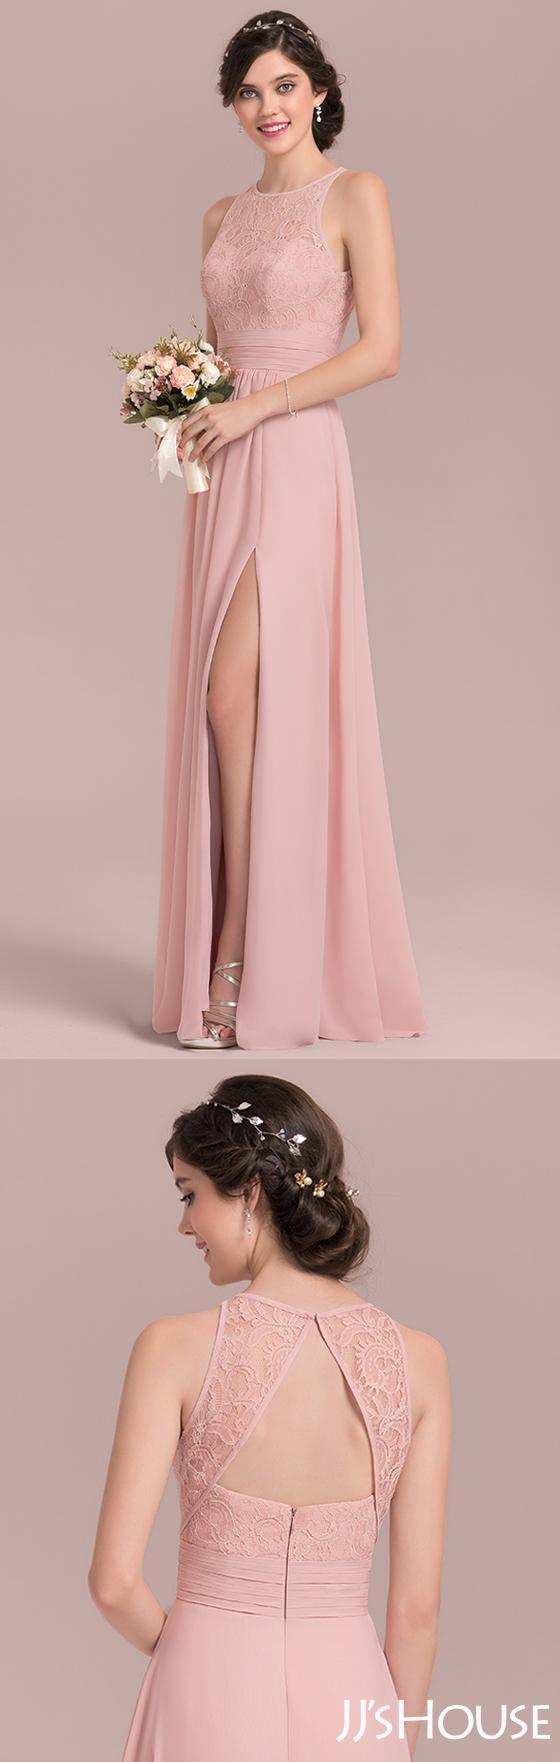 Pin de Roxana Galo en vestidos | Pinterest | Vestiditos, Damas de ...